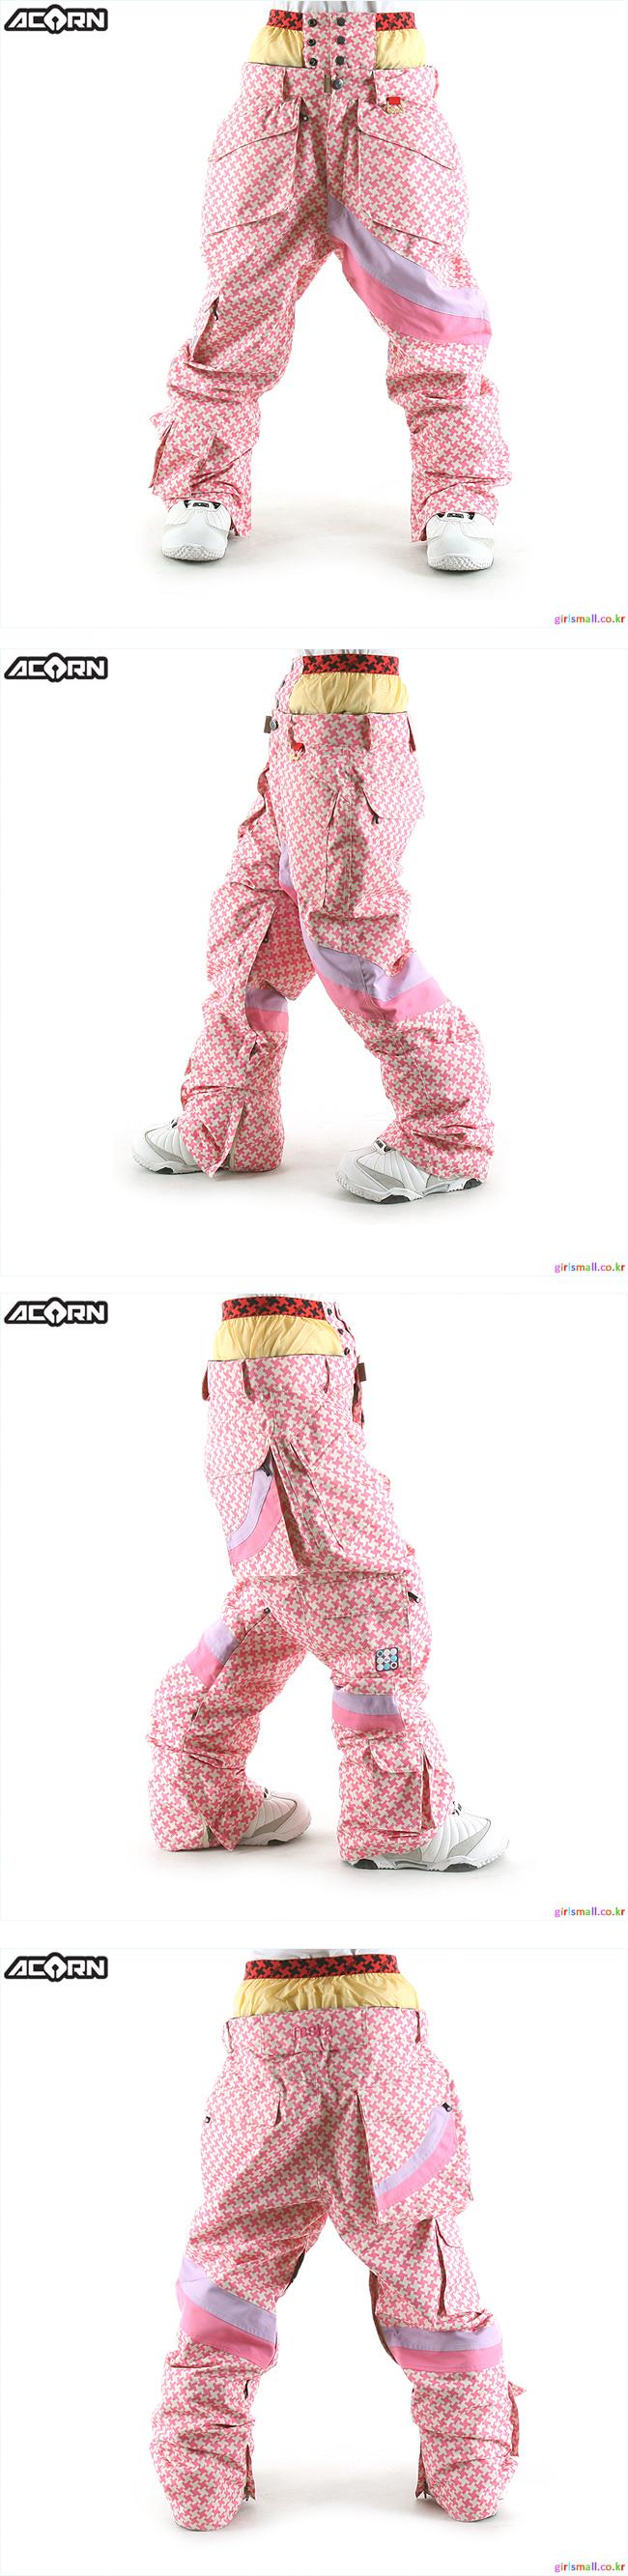 3b1fb3bd 0809에이콘신상품 acornkorea | HIT : 14,029 UPLOAD 1 ...